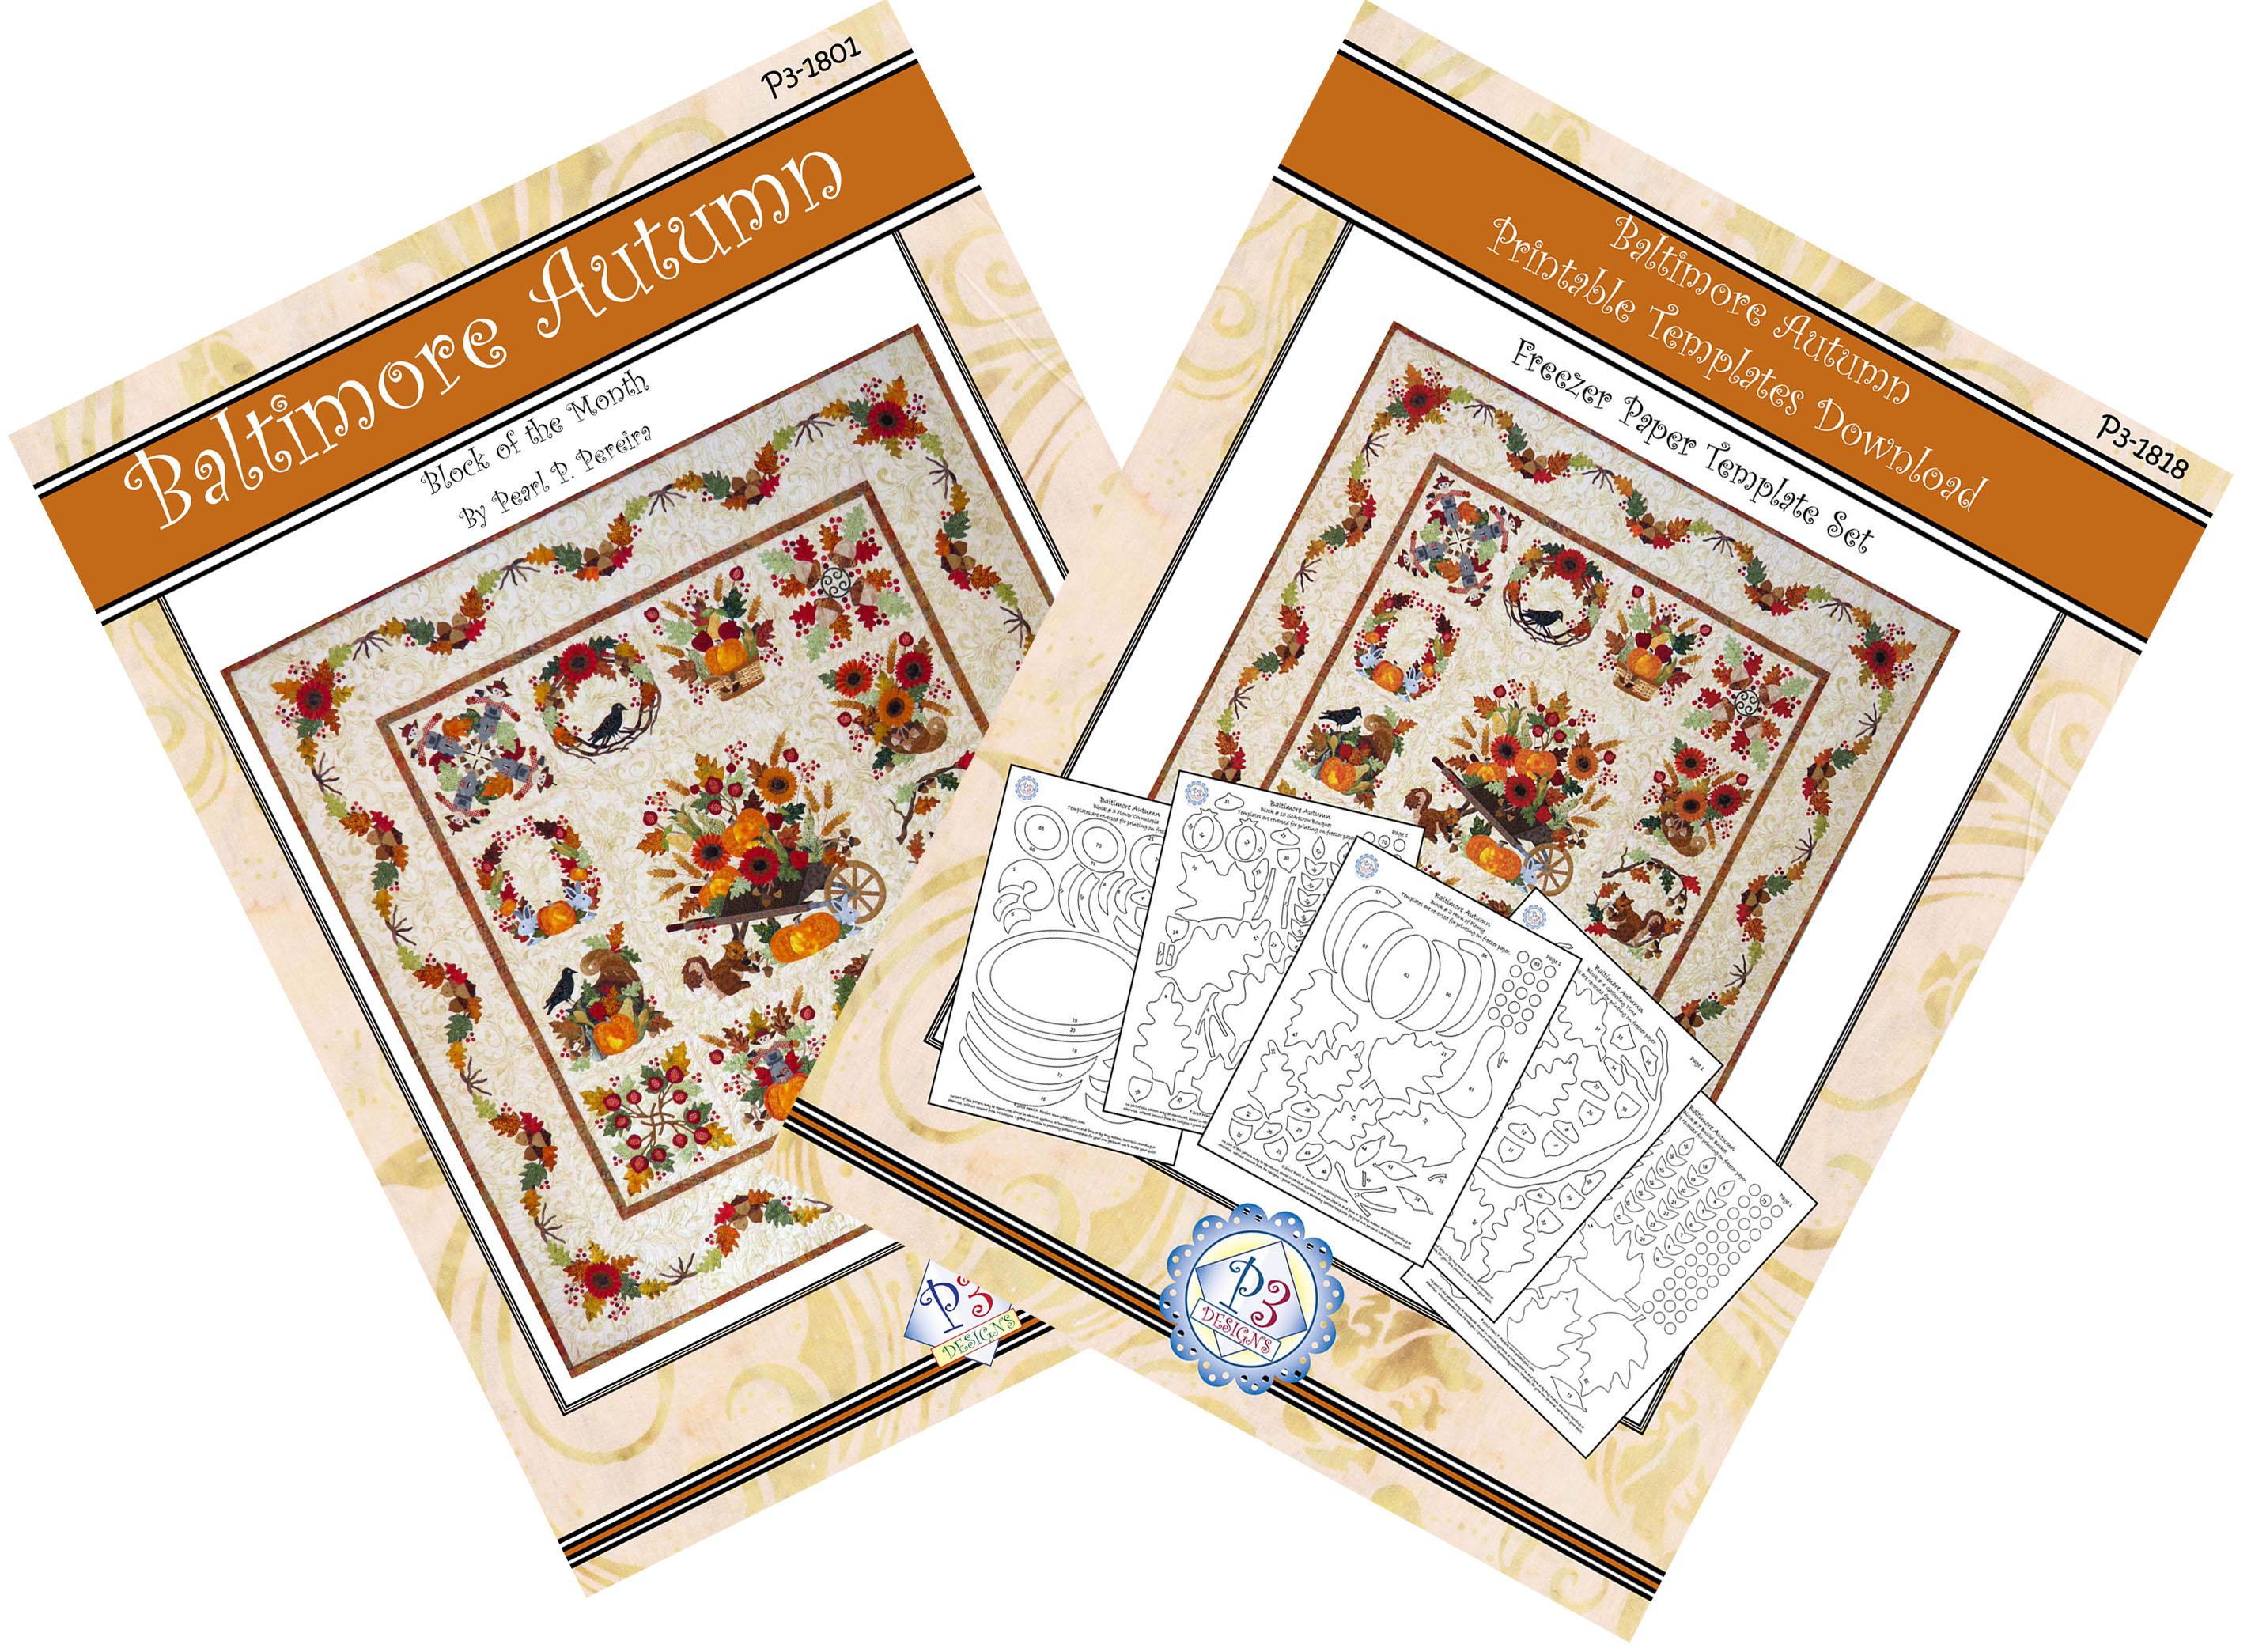 P3-1800-1 Baltimore Autumn Pattern Set & Printable Template PDF Download